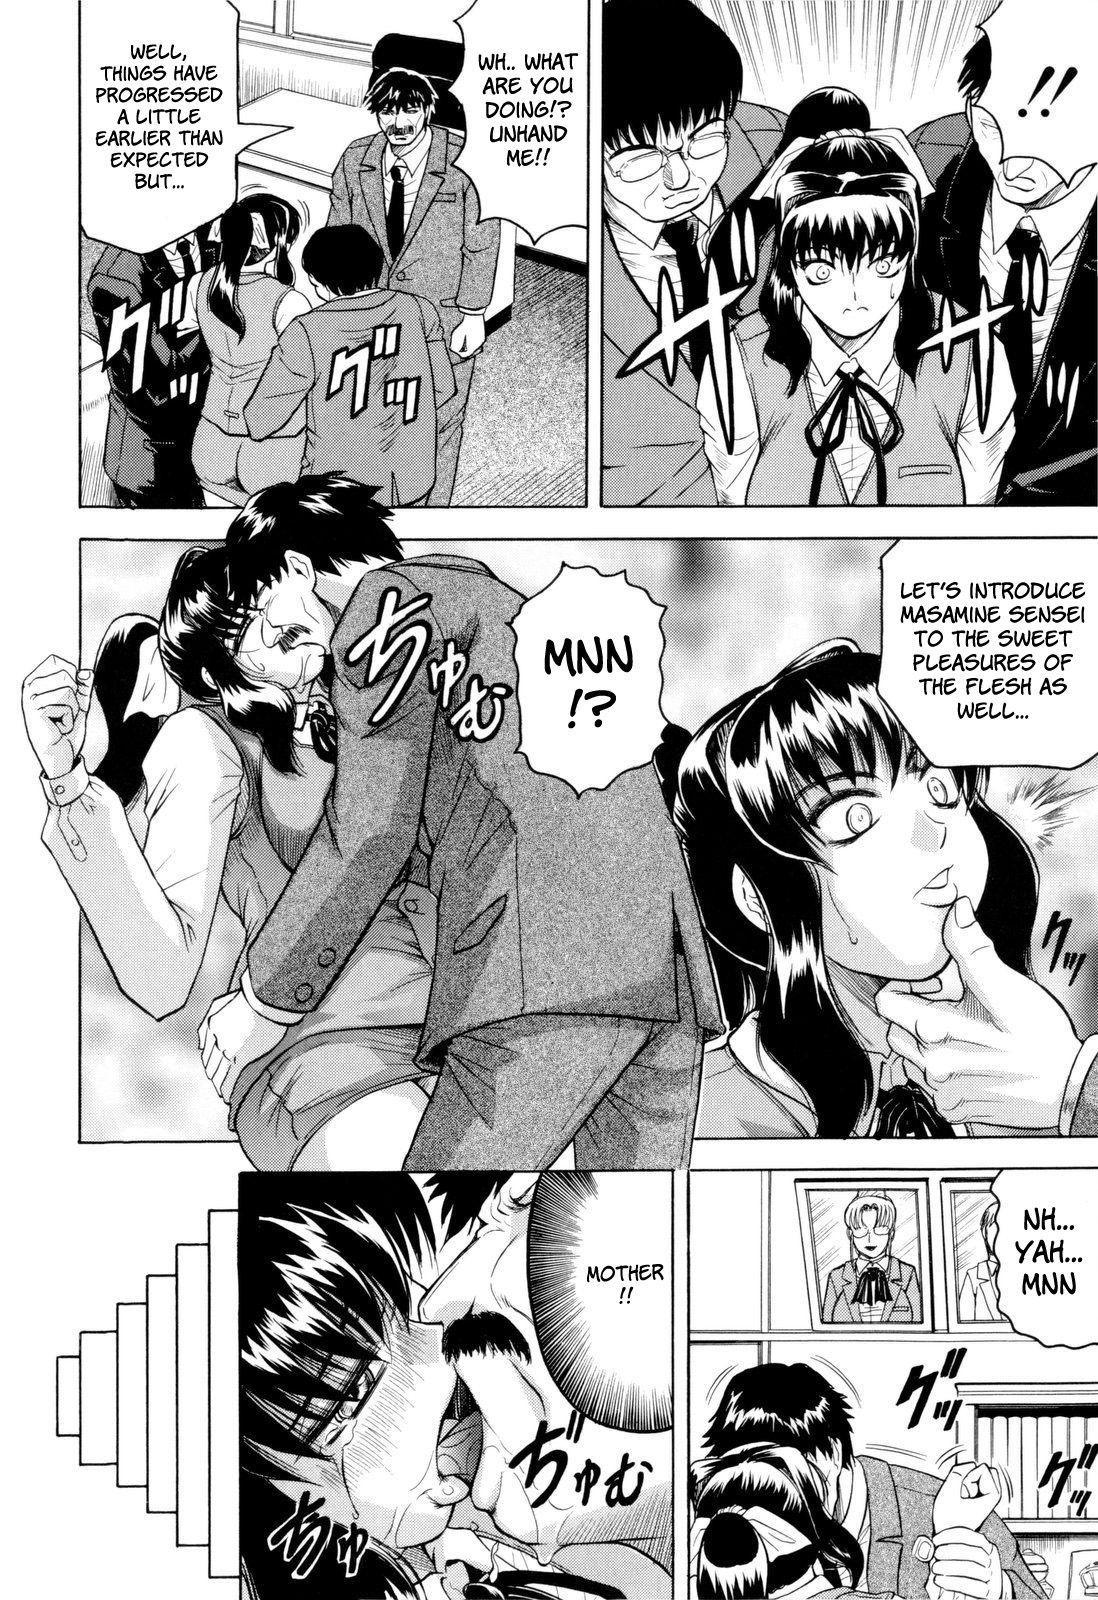 Sensei ni Dashitee! - It ejaculates in the teacher! 129